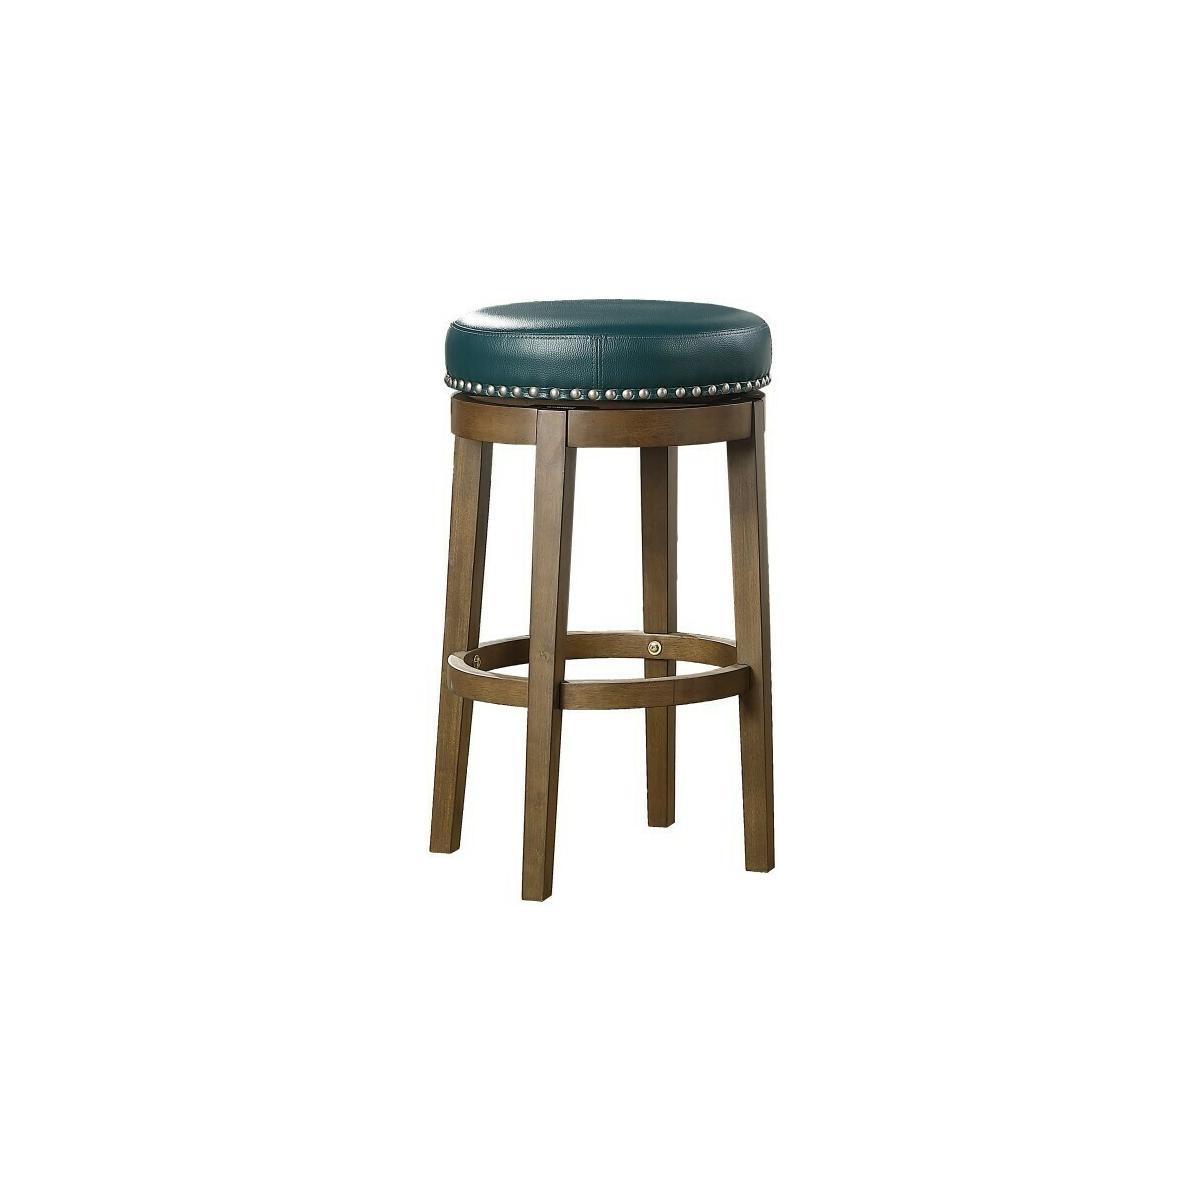 Round Swivel Pub Height Stool, Green